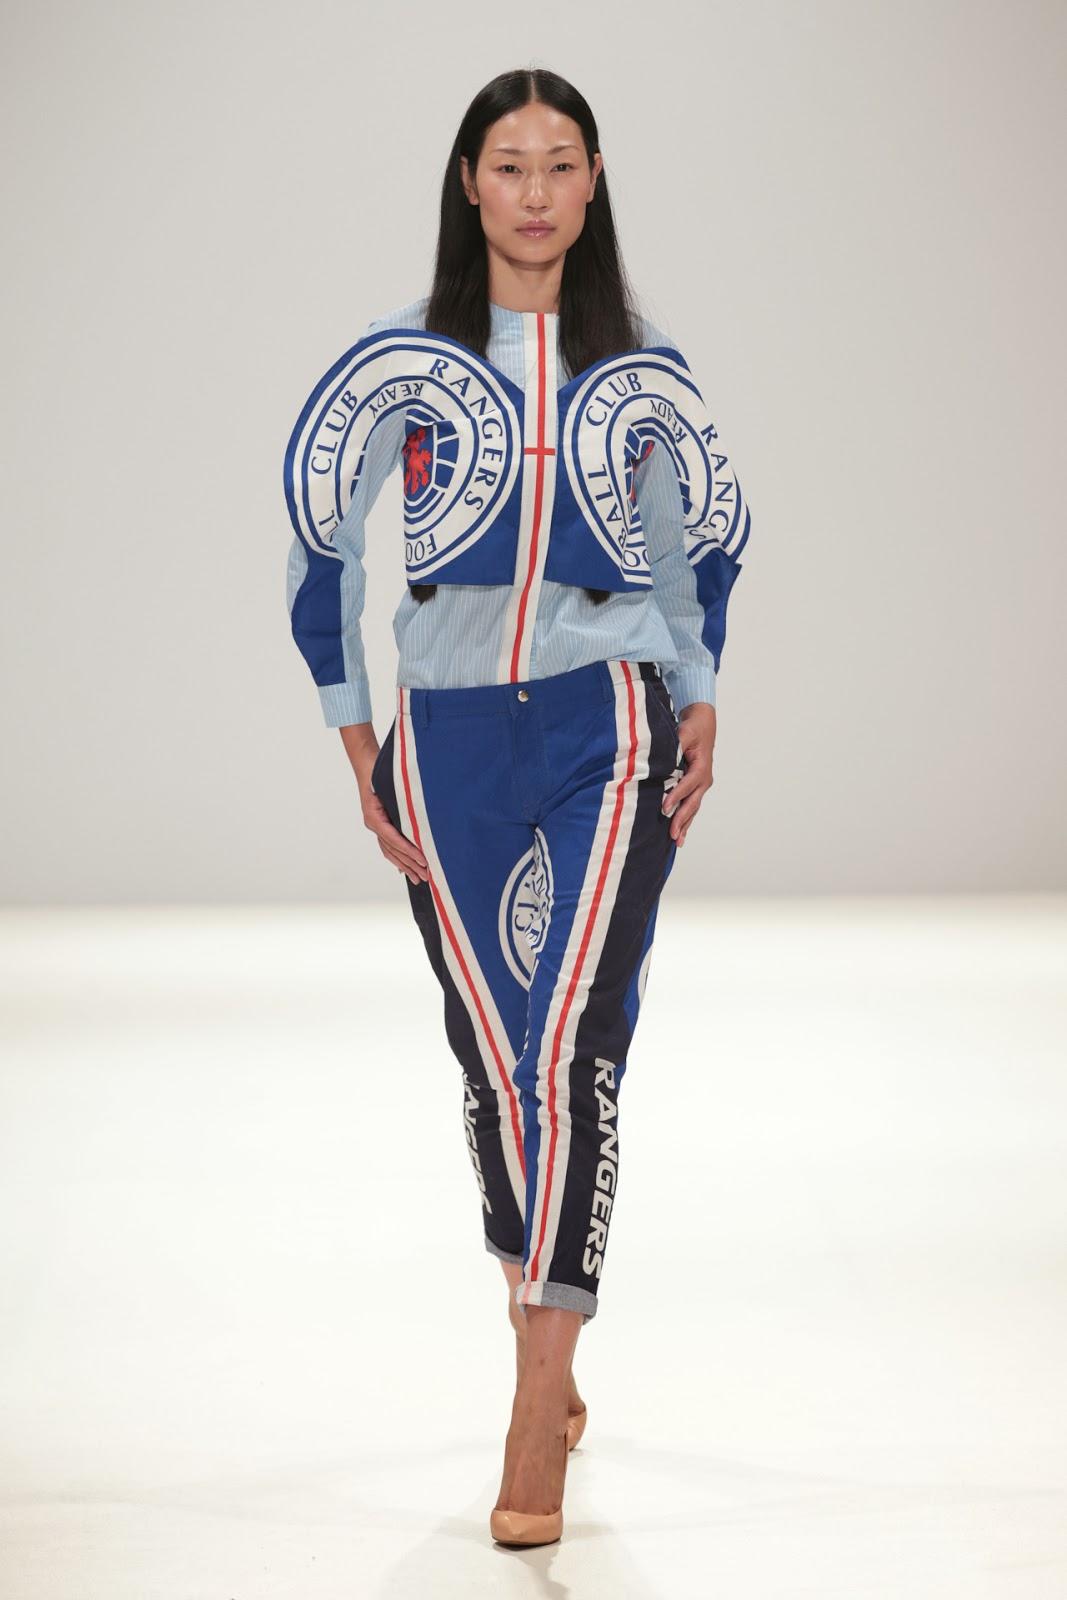 2d1e8afaa65 and a childlike interpretation of the Rangers Football club logo on a  jumpsuit.